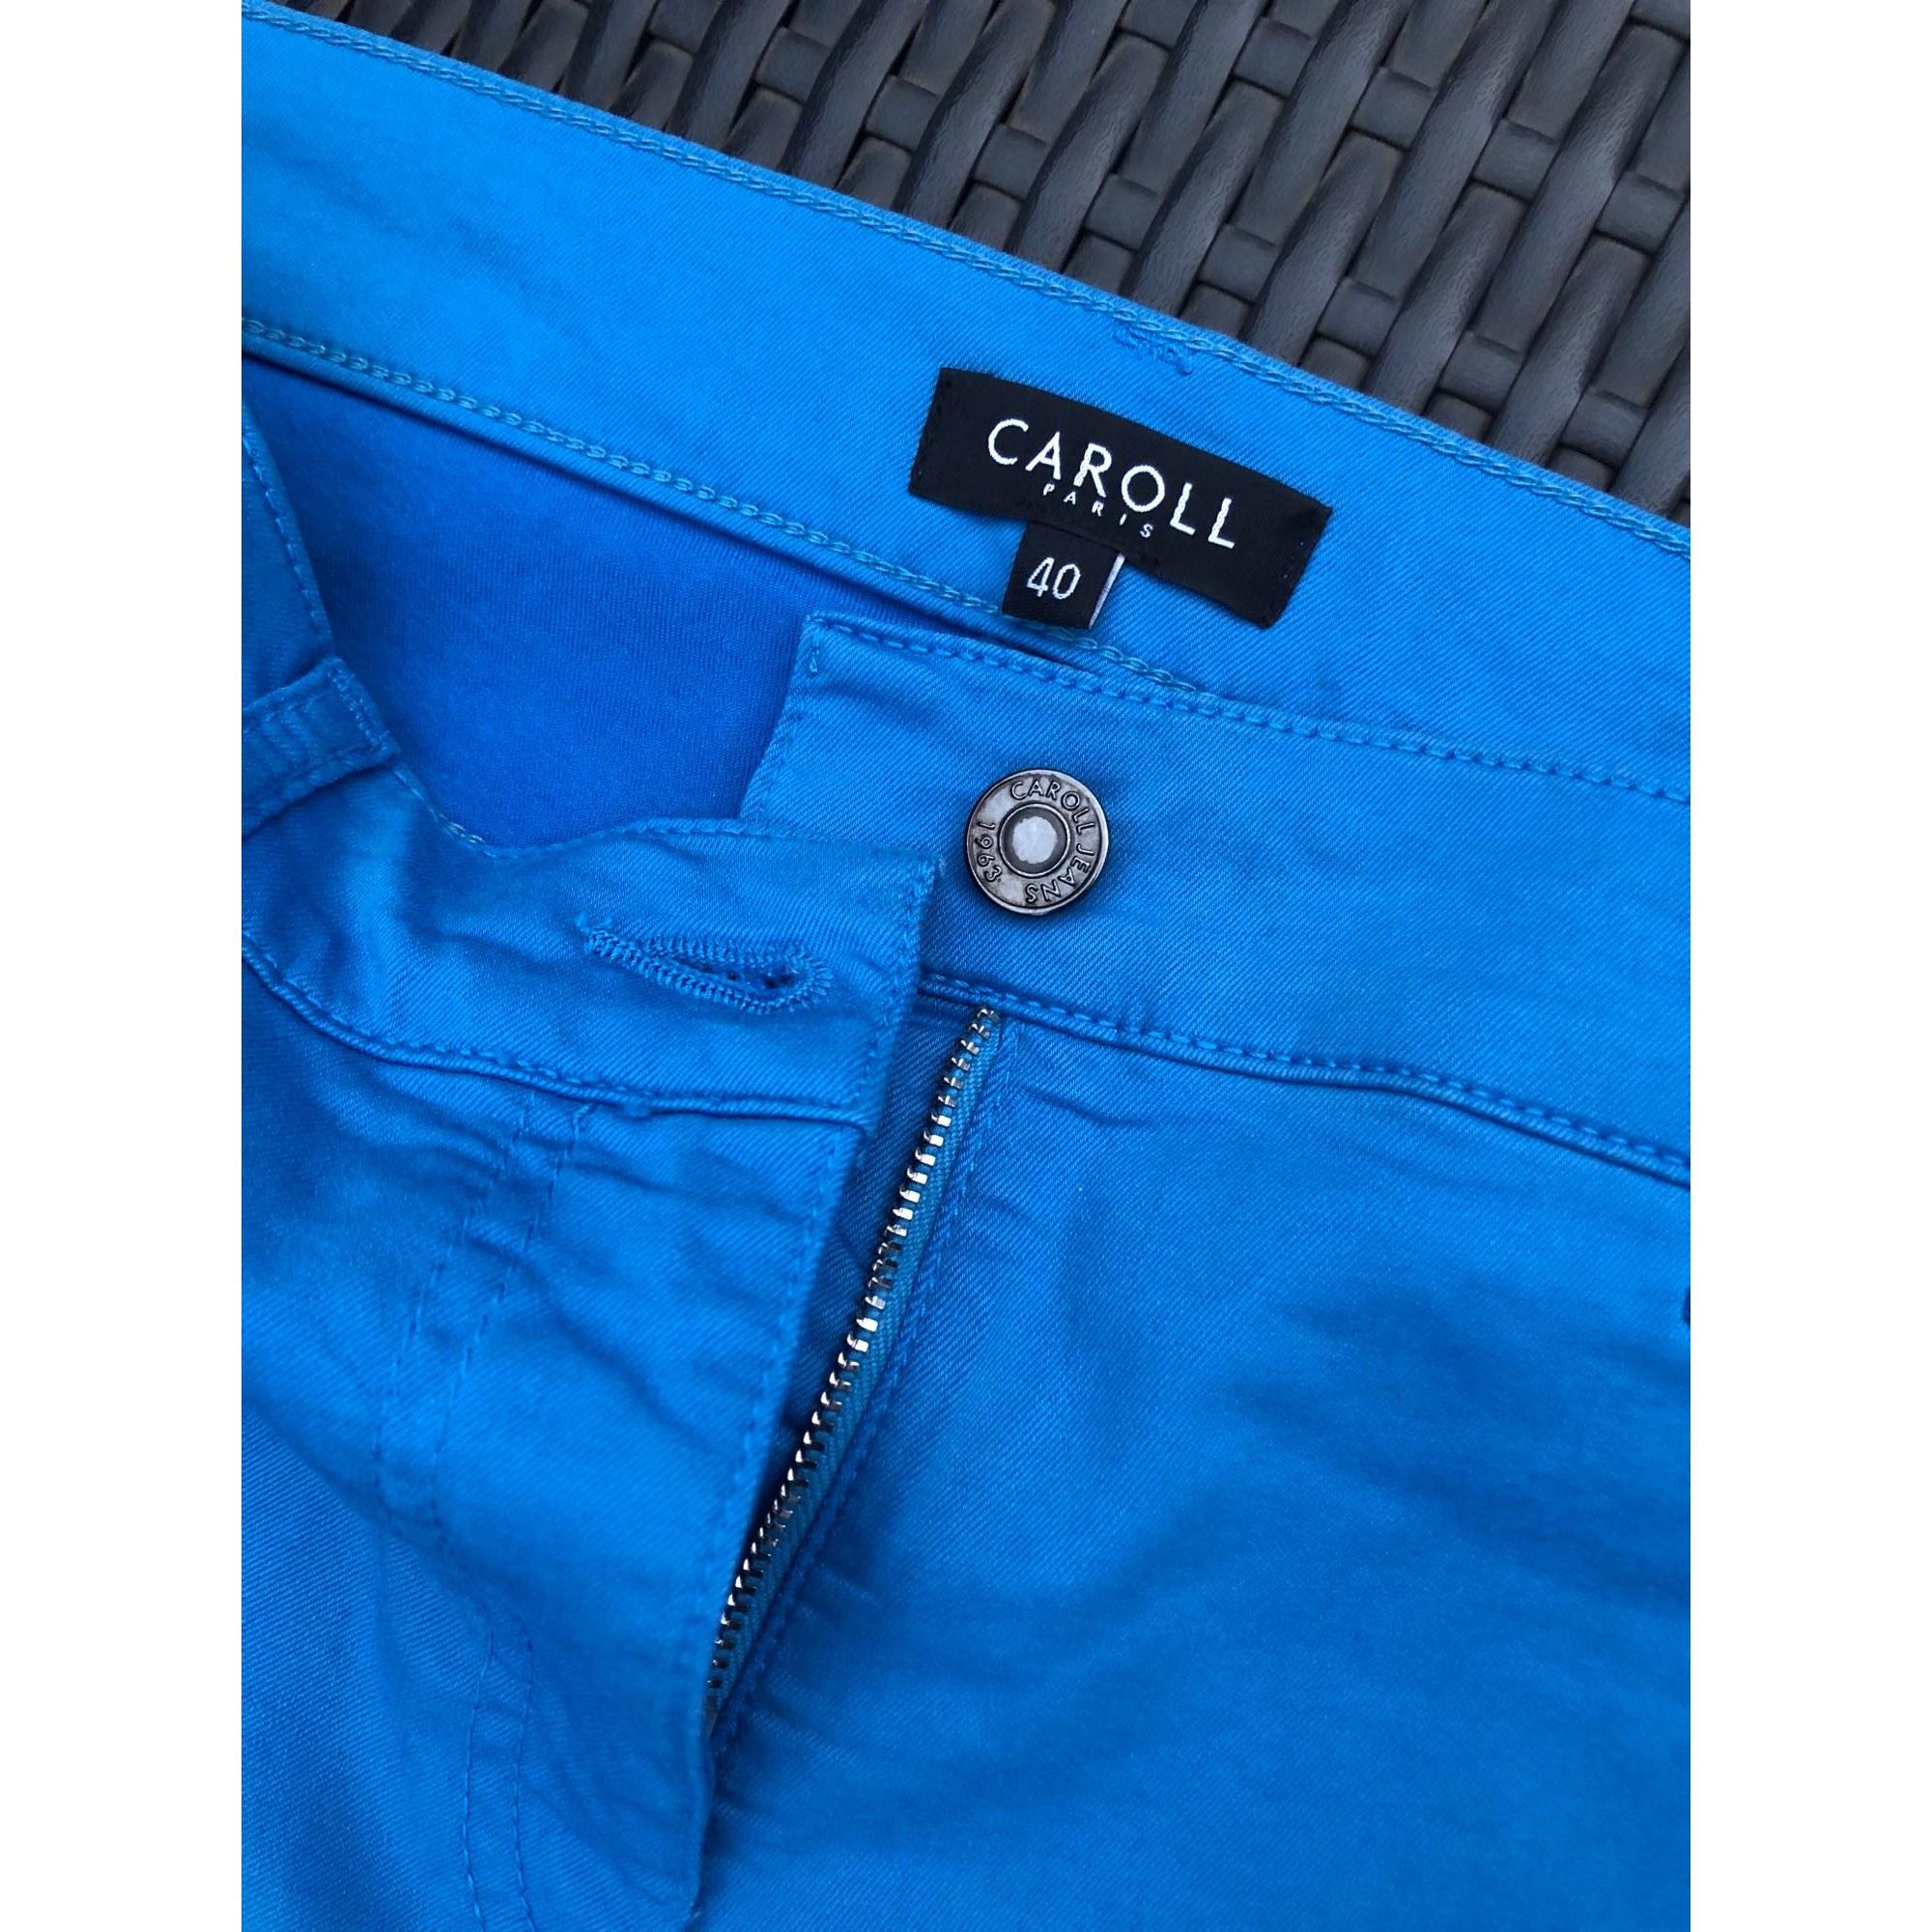 25169e545ea Pantalon droit CAROLL 40 (L